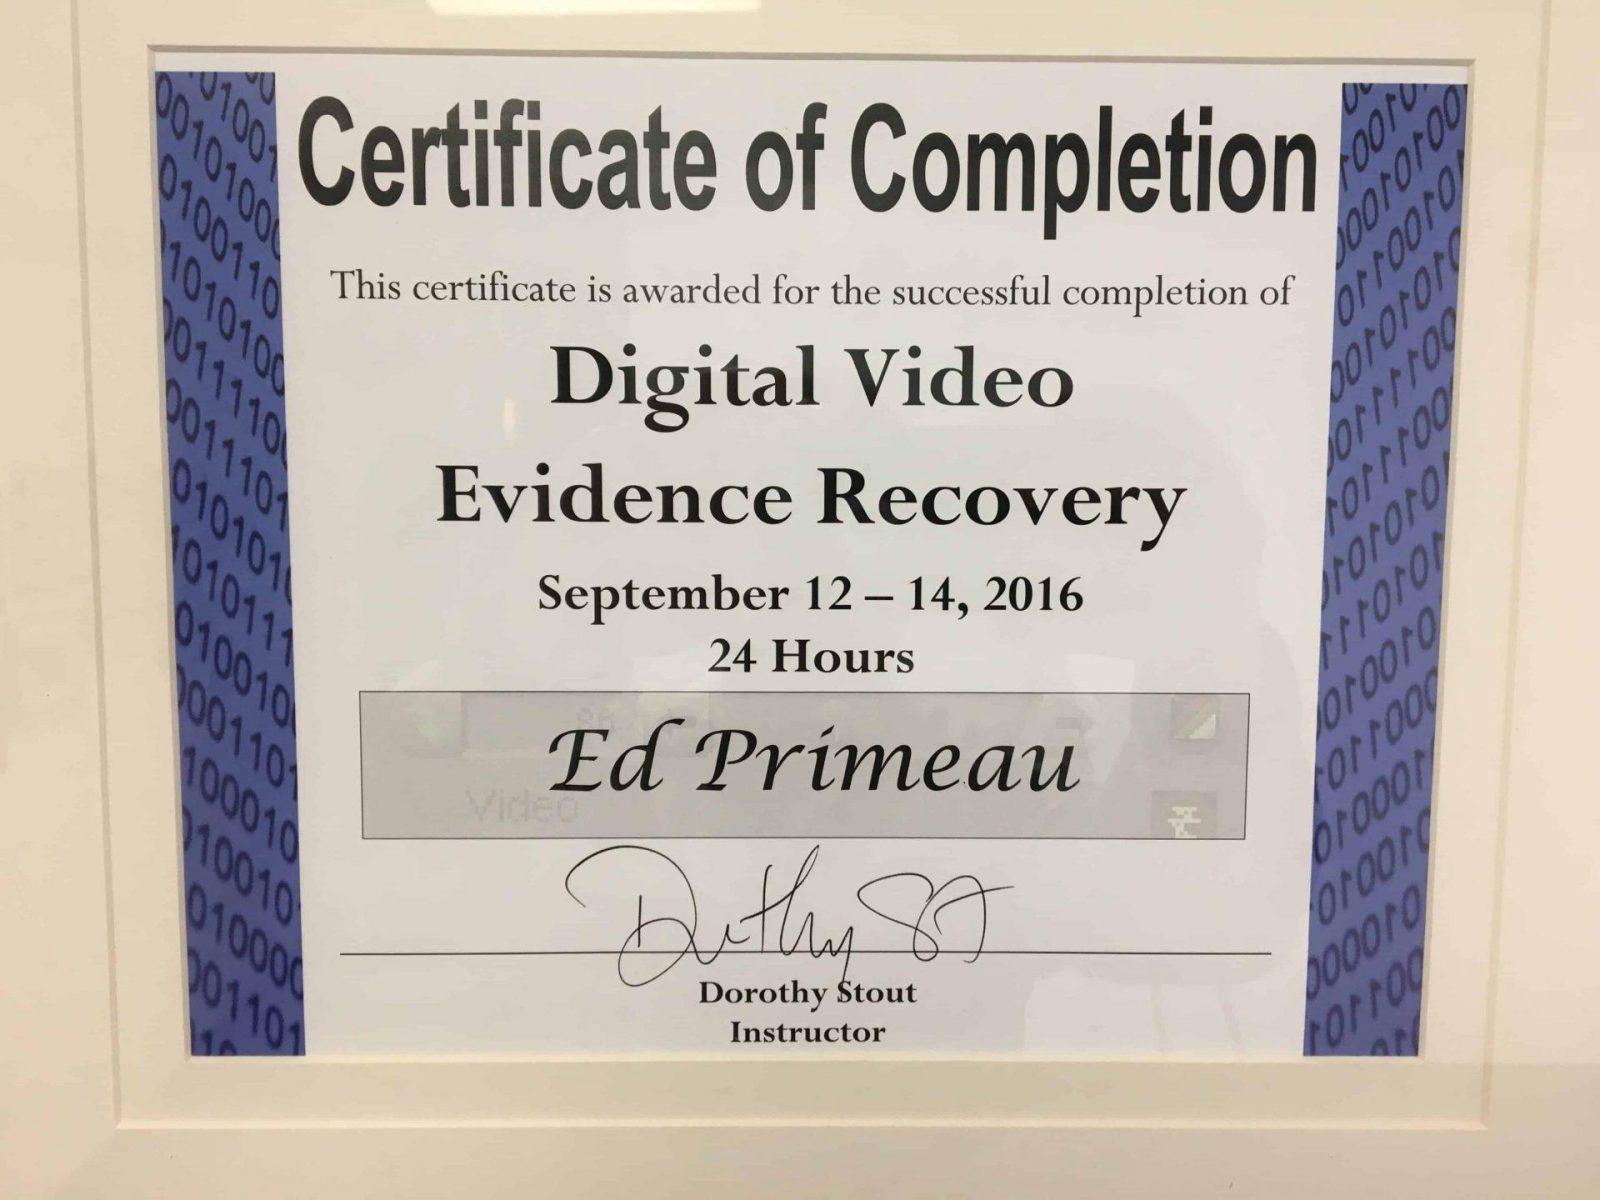 Digital-Video-Evidence-Recovery-Edward-Primeau Meet Edward Primeau, CCI, CFC